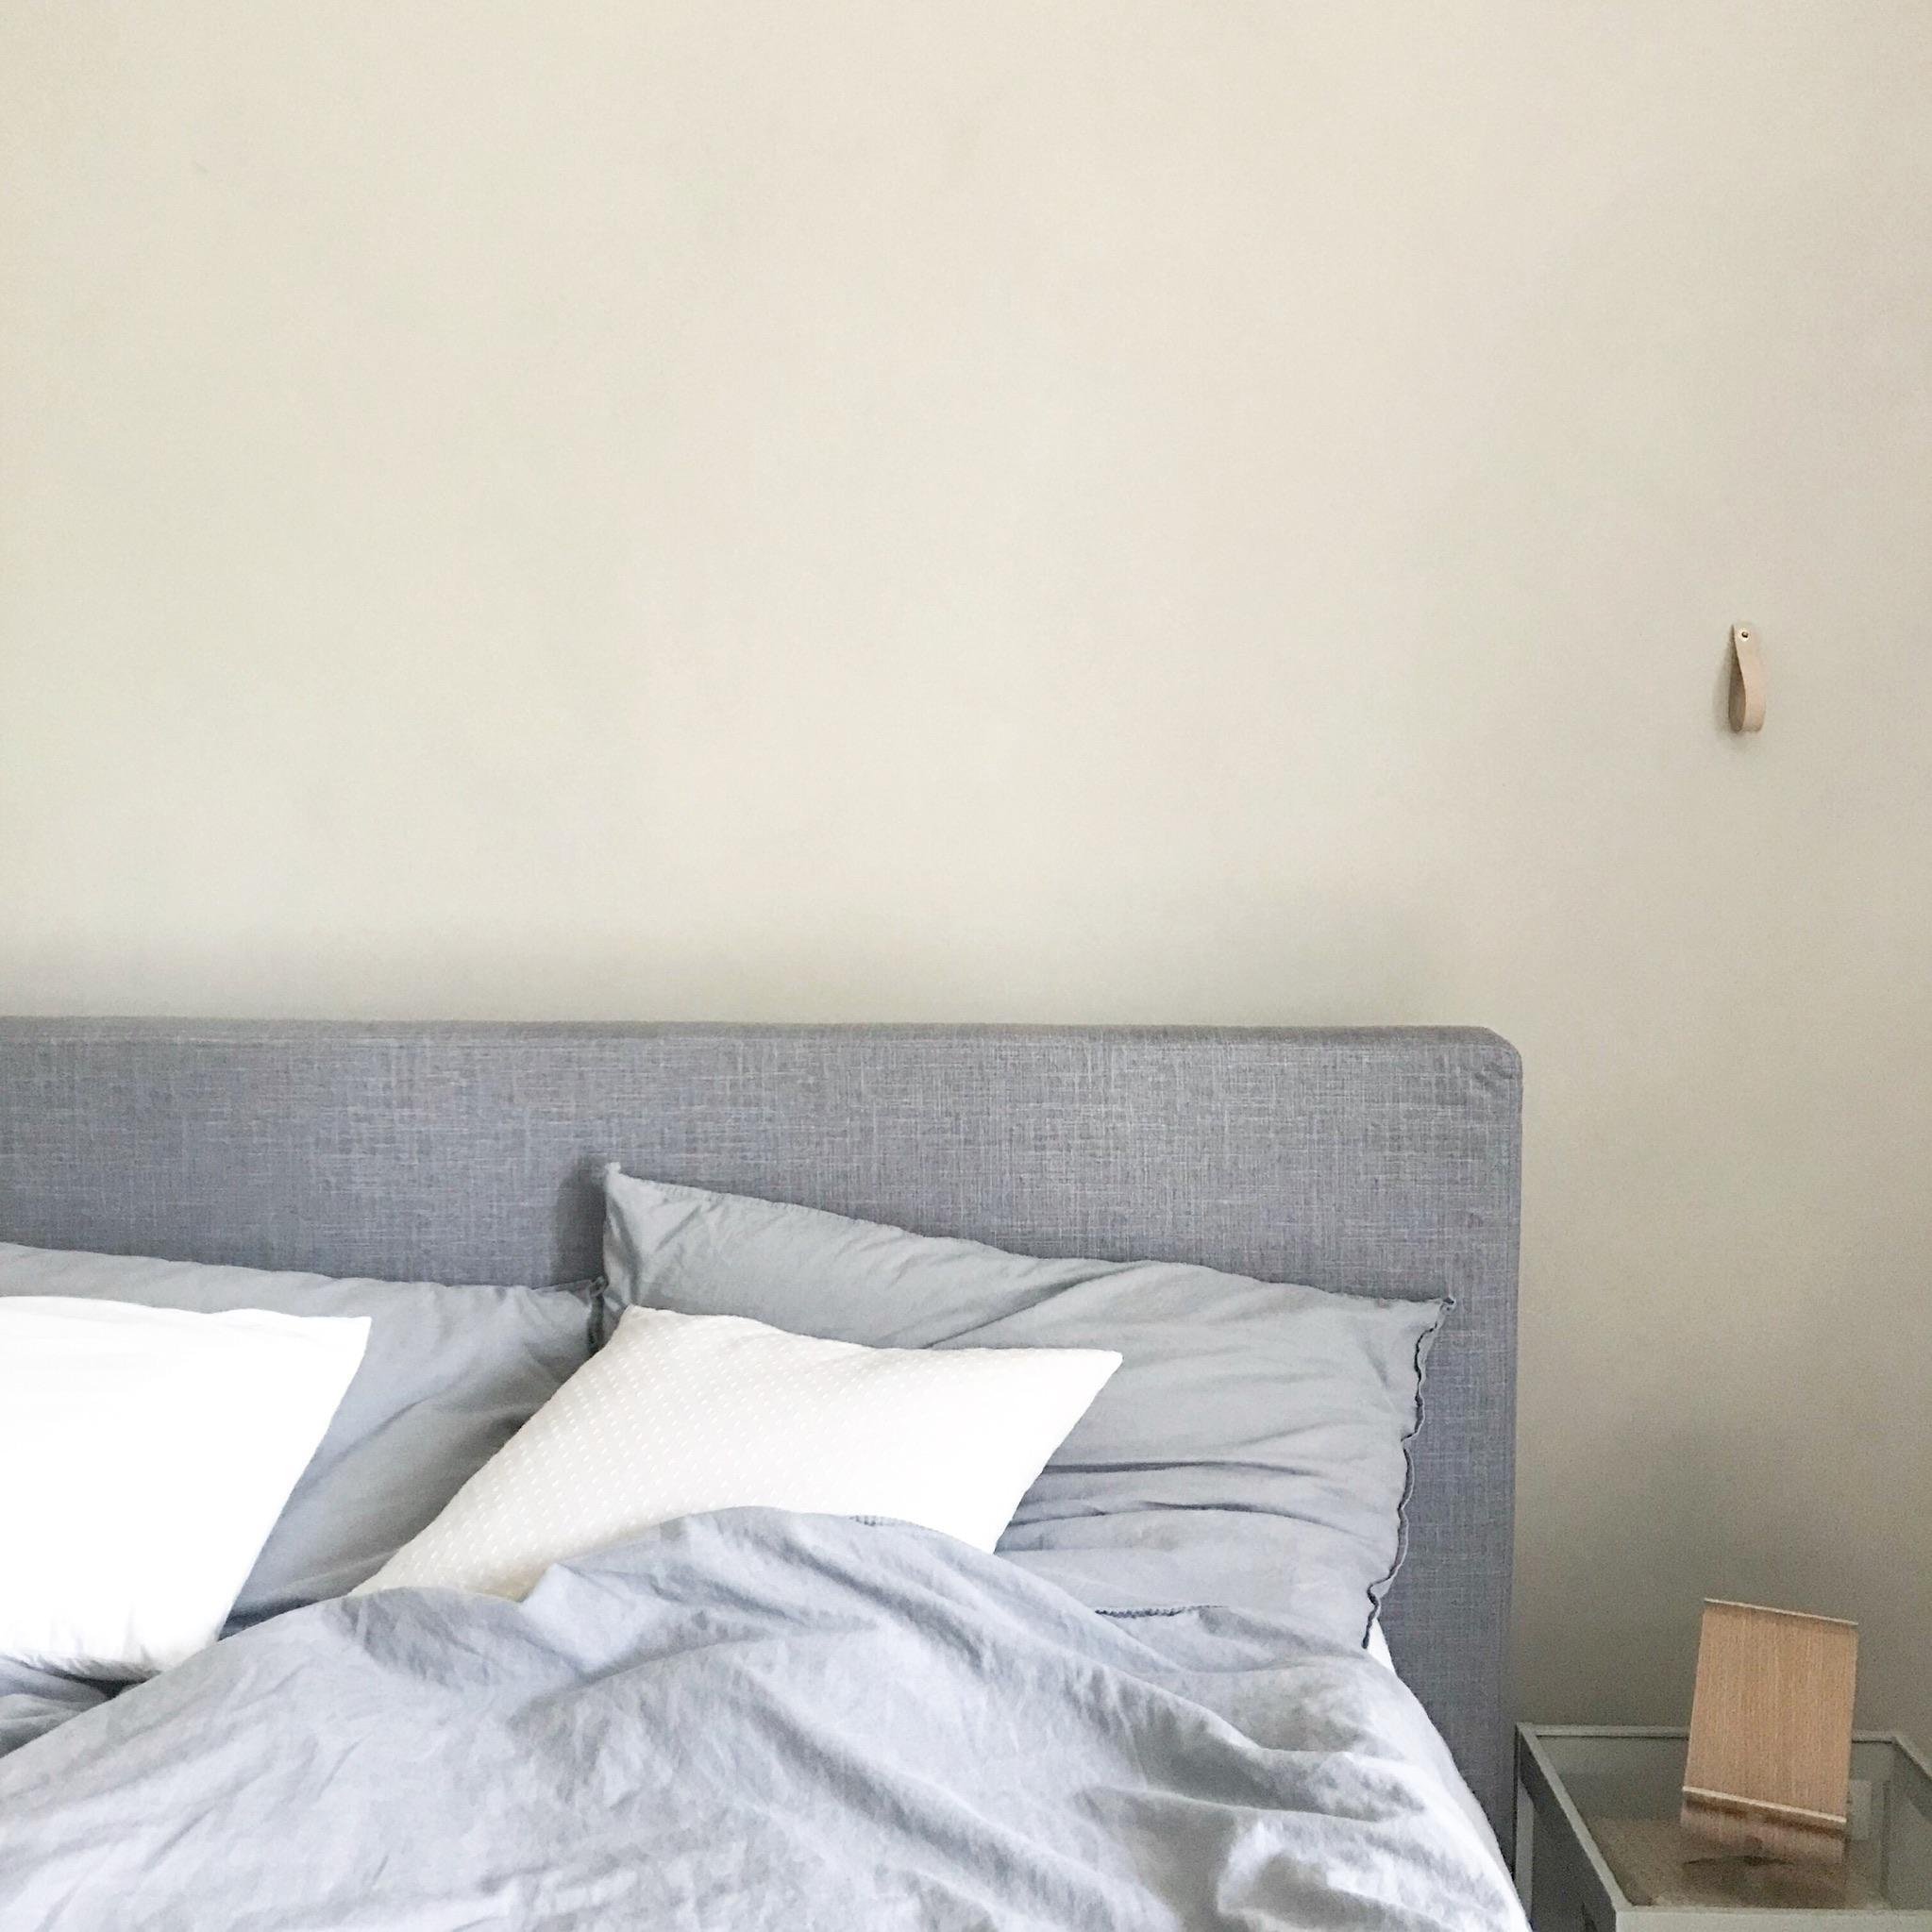 Senfgelbe Wandfarbe • Bilder & Ideen • COUCH